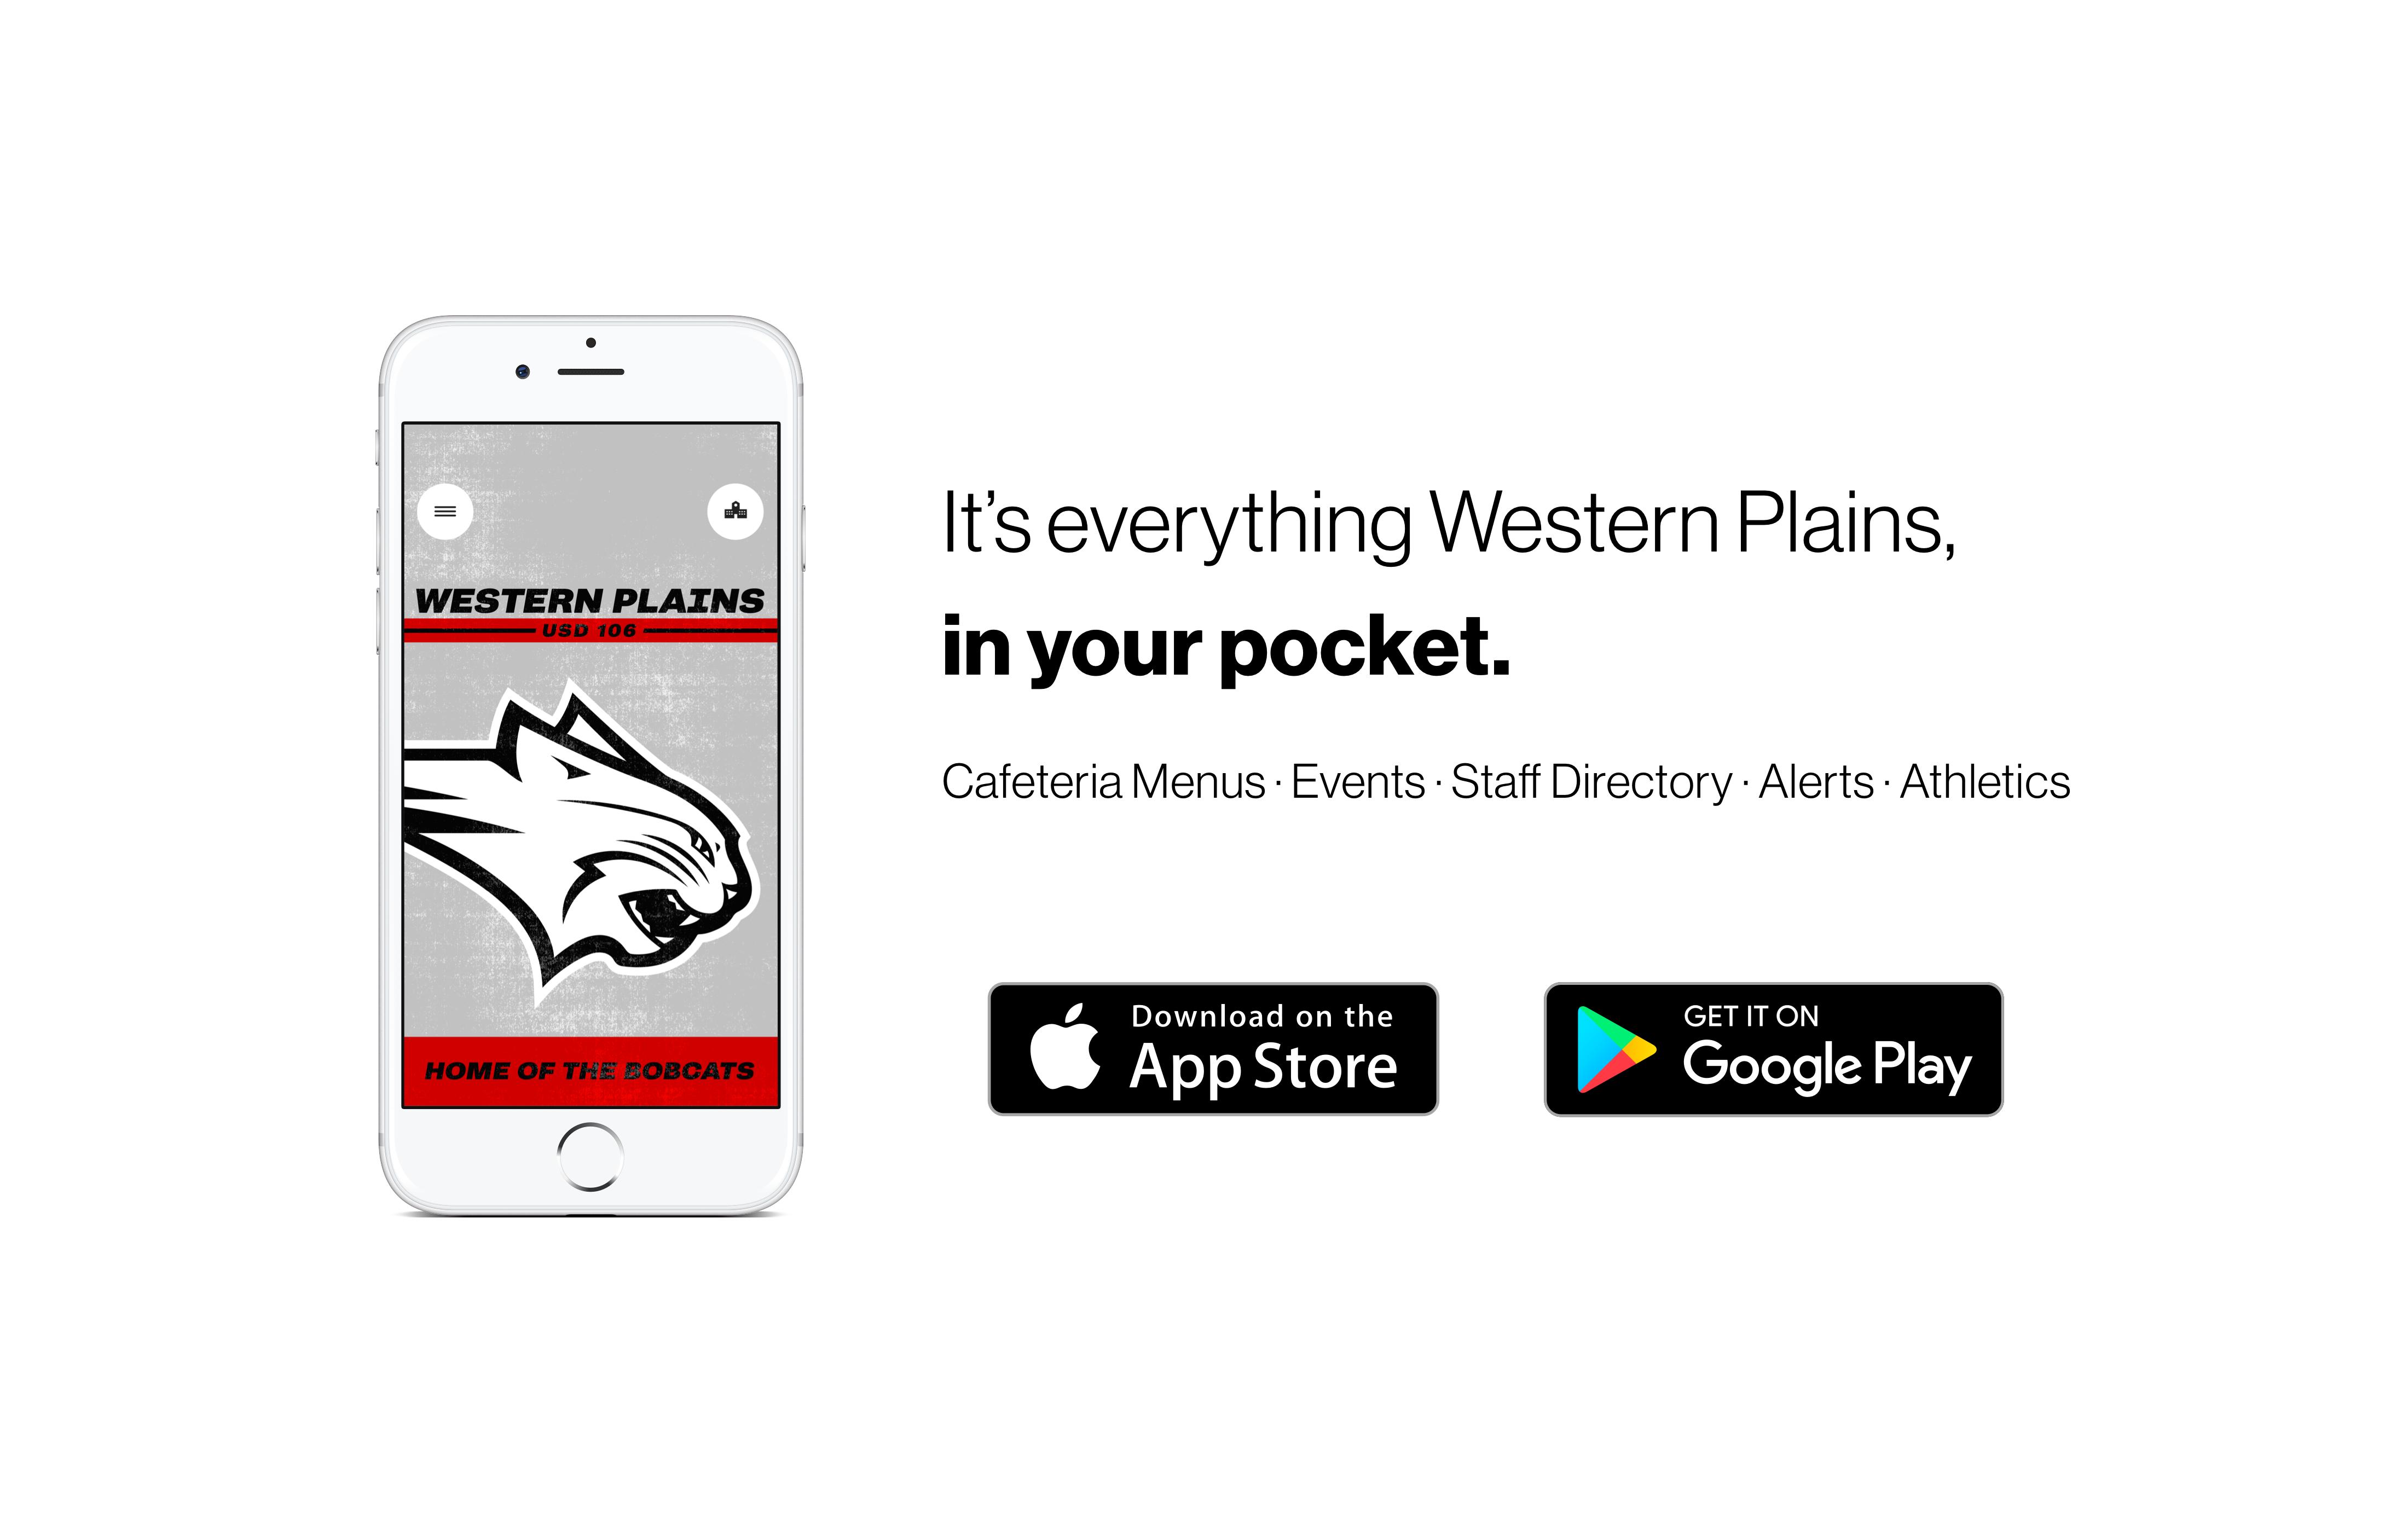 Western Plains App Advertisement